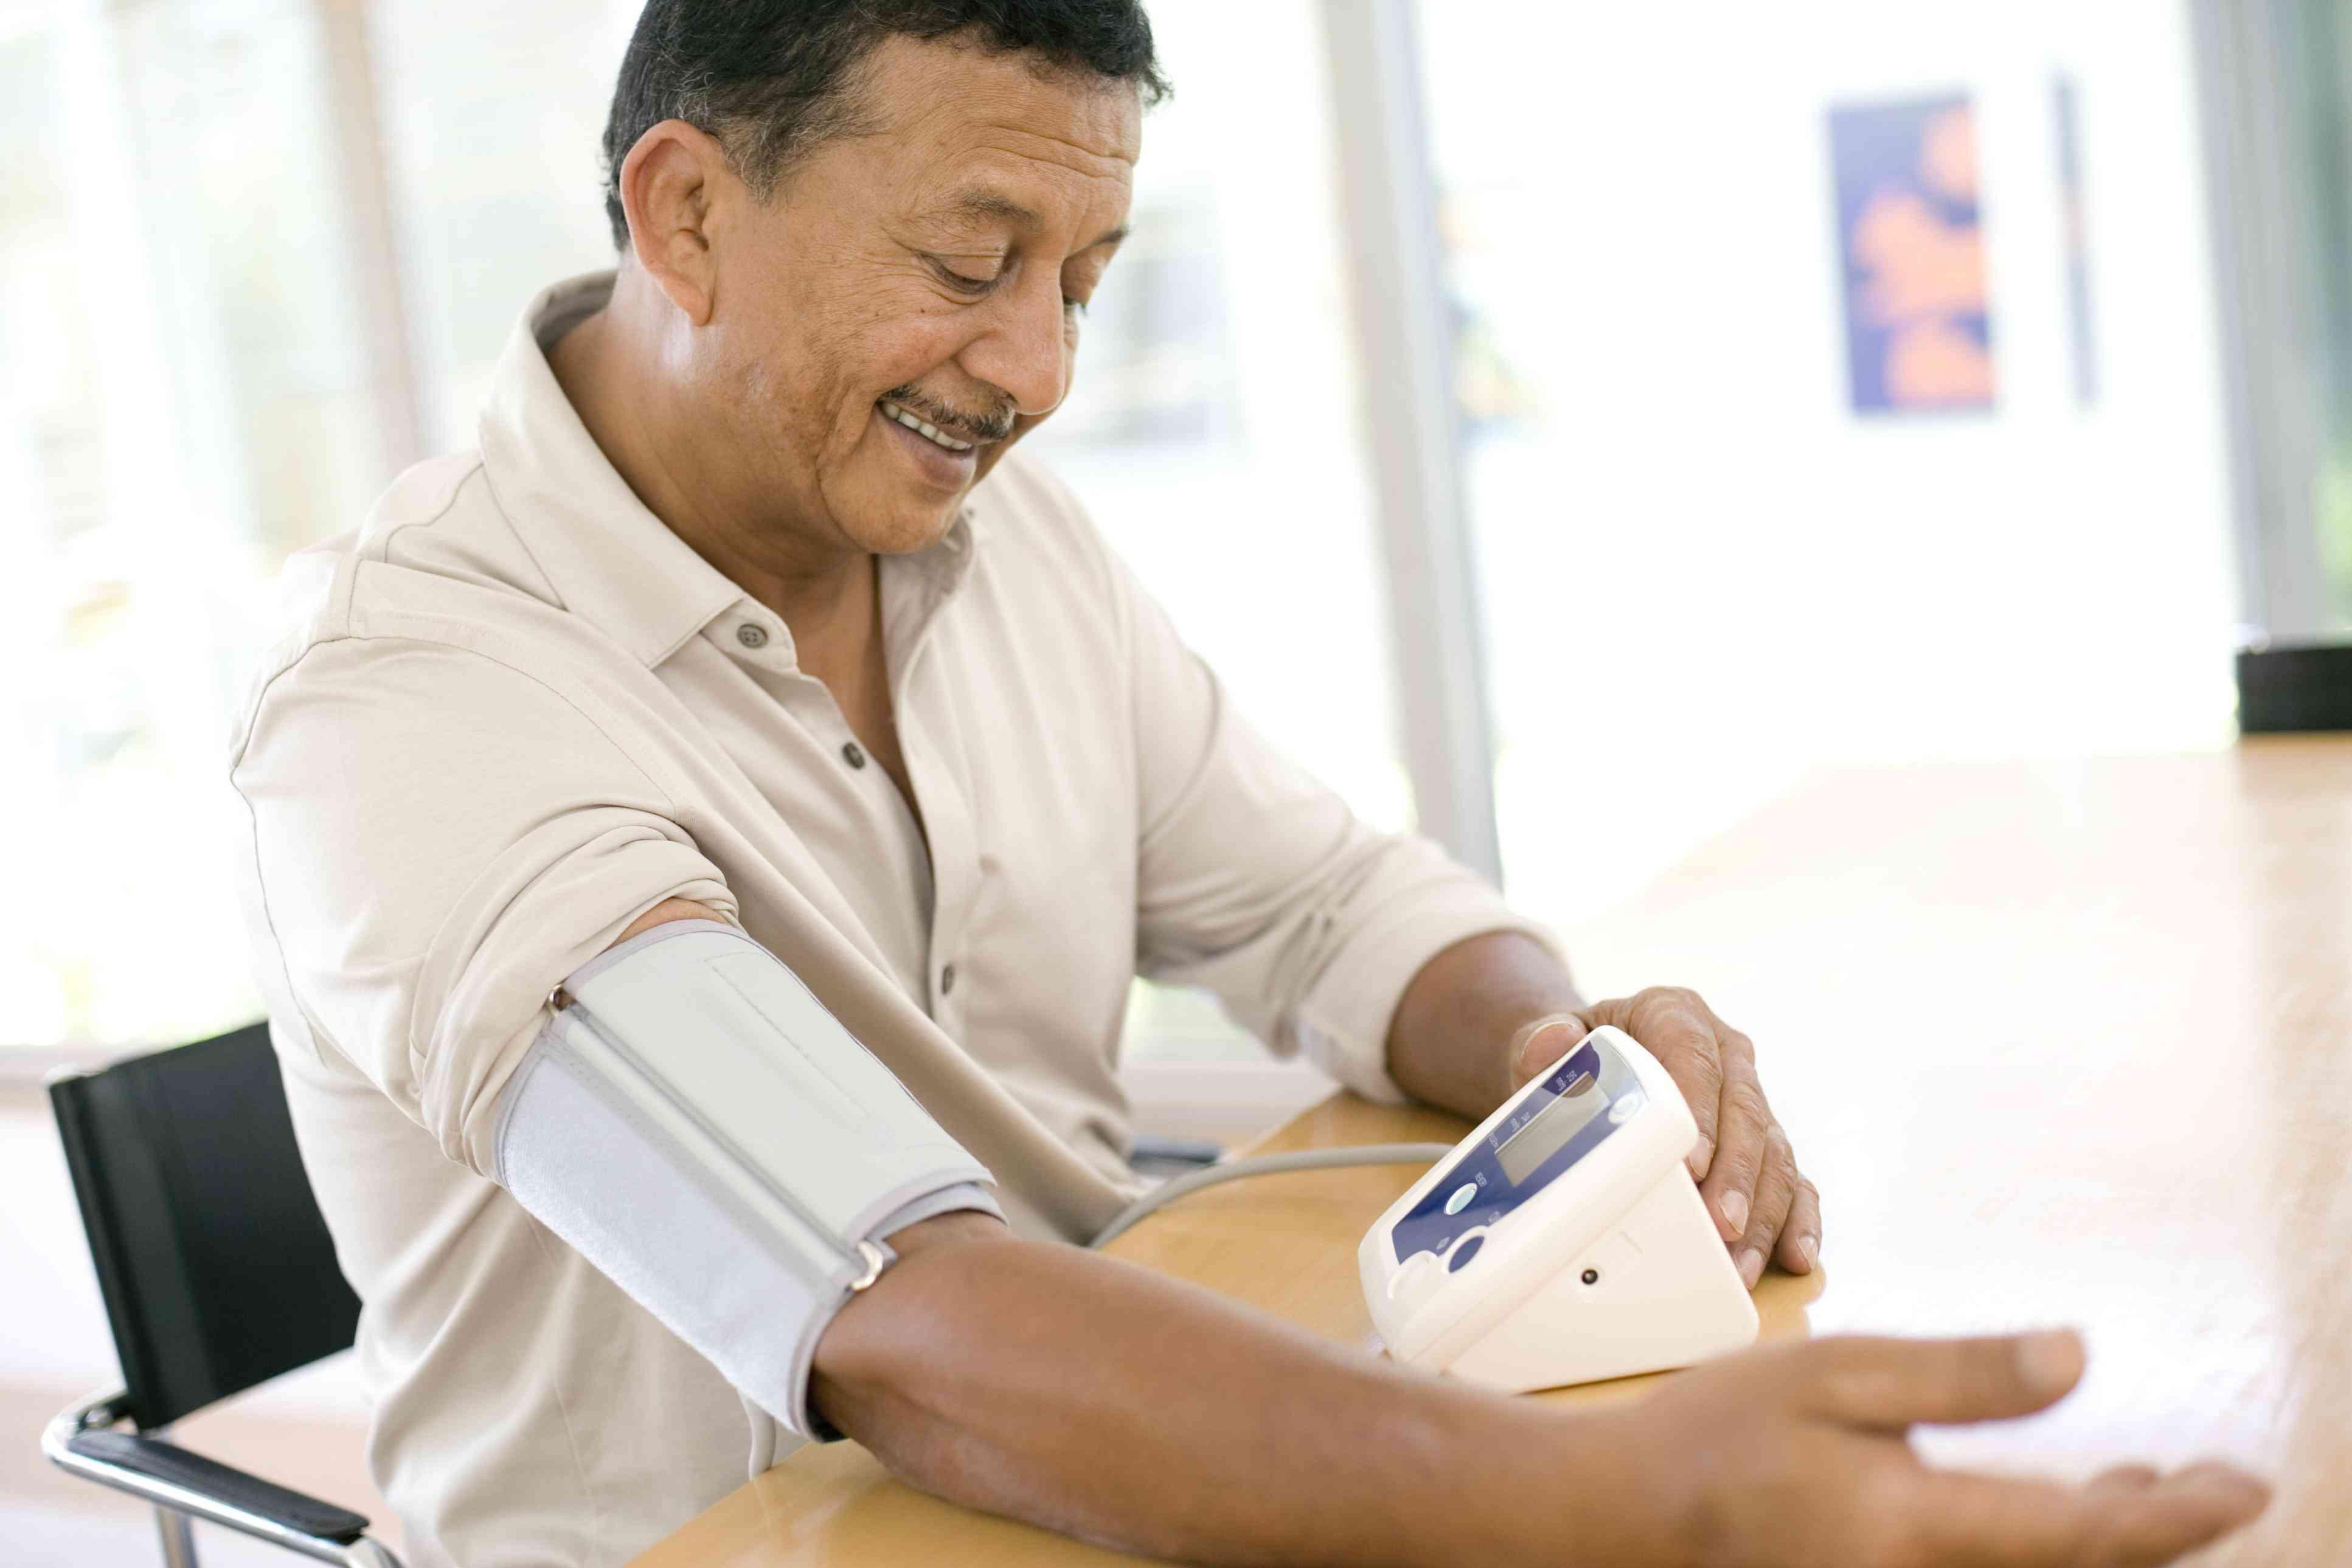 A man checks his blood pressure at home